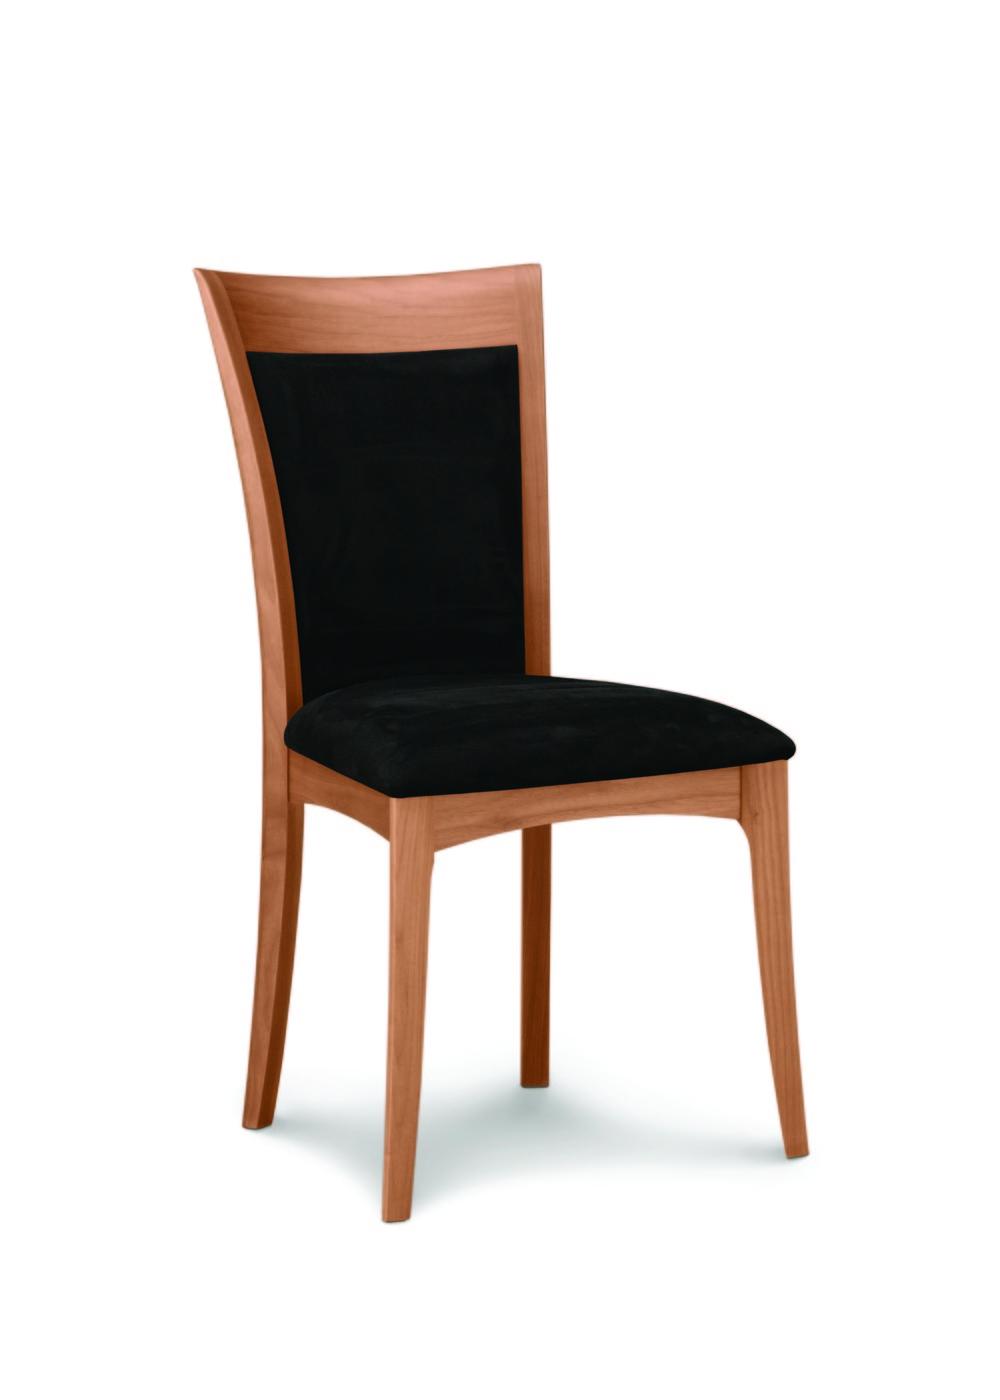 Copeland Furniture - Morgan Side Chair